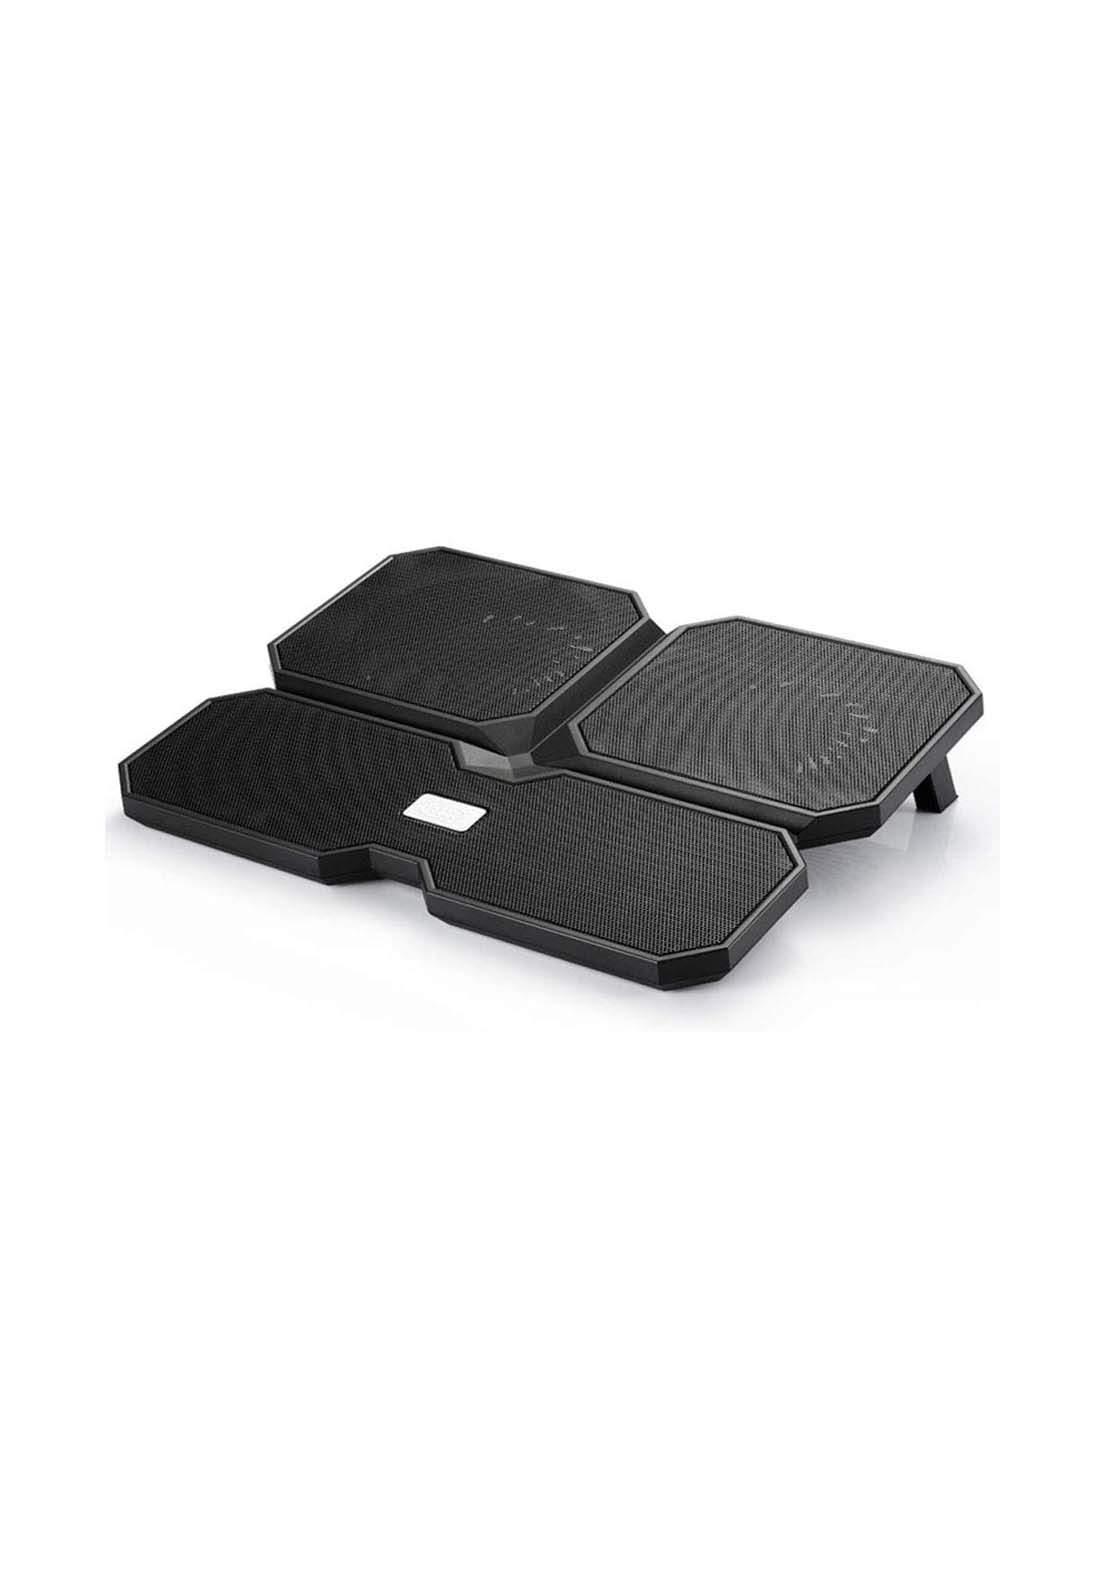 DeepCool  Multi Core X6 Laptop Cooling Pad  - Black مروحة لابتوب